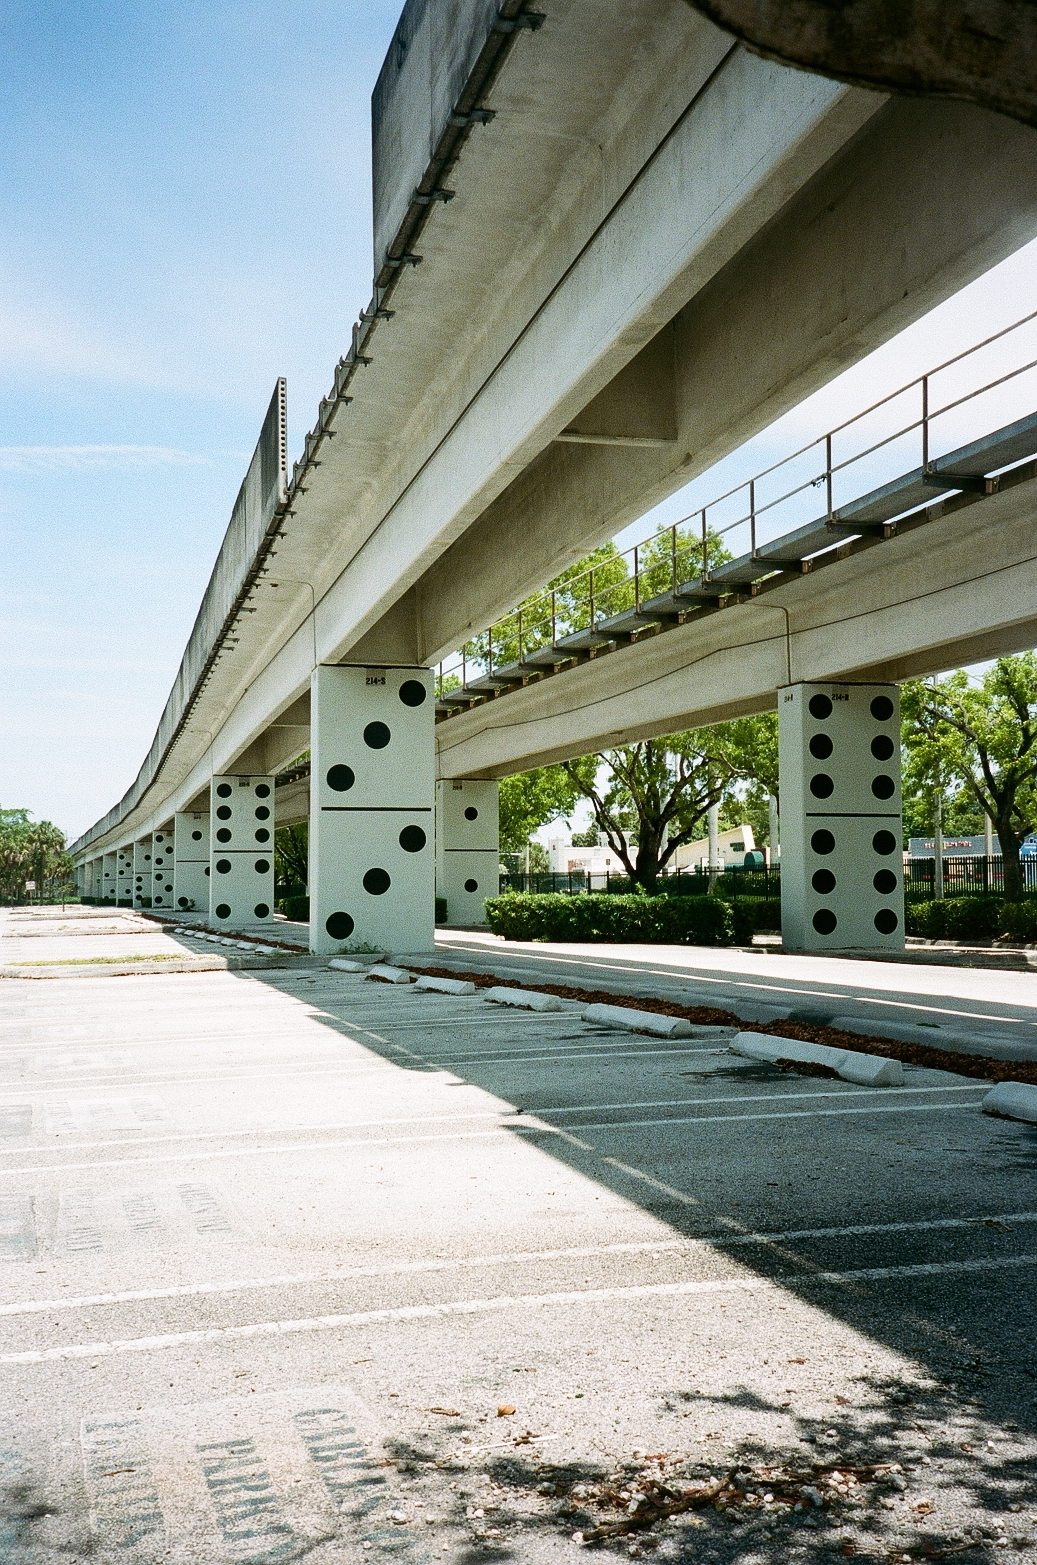 Miami film photo of domino's artwork under metro rail